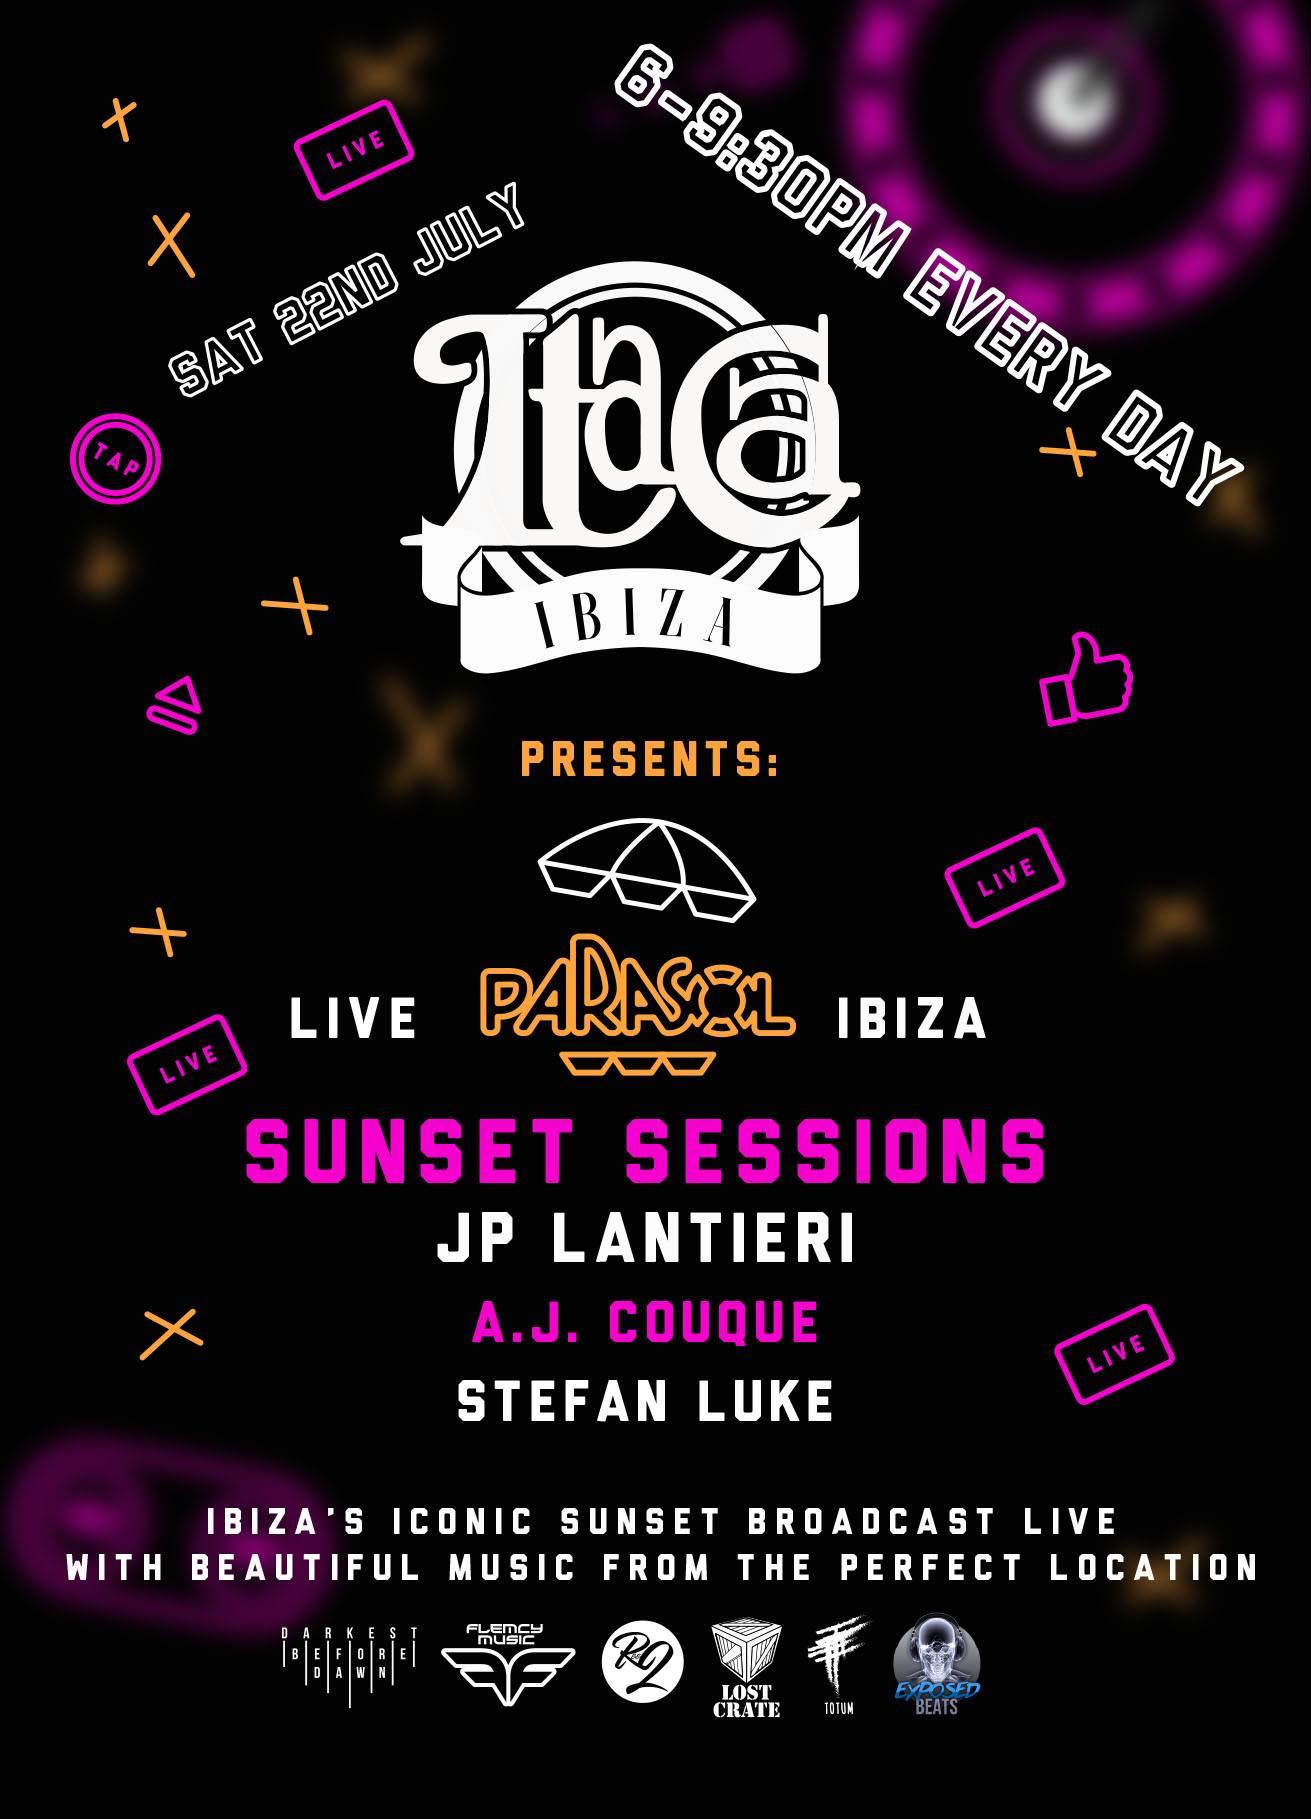 Parasol Ibiza tour 22Jul Itaca sunset sessions